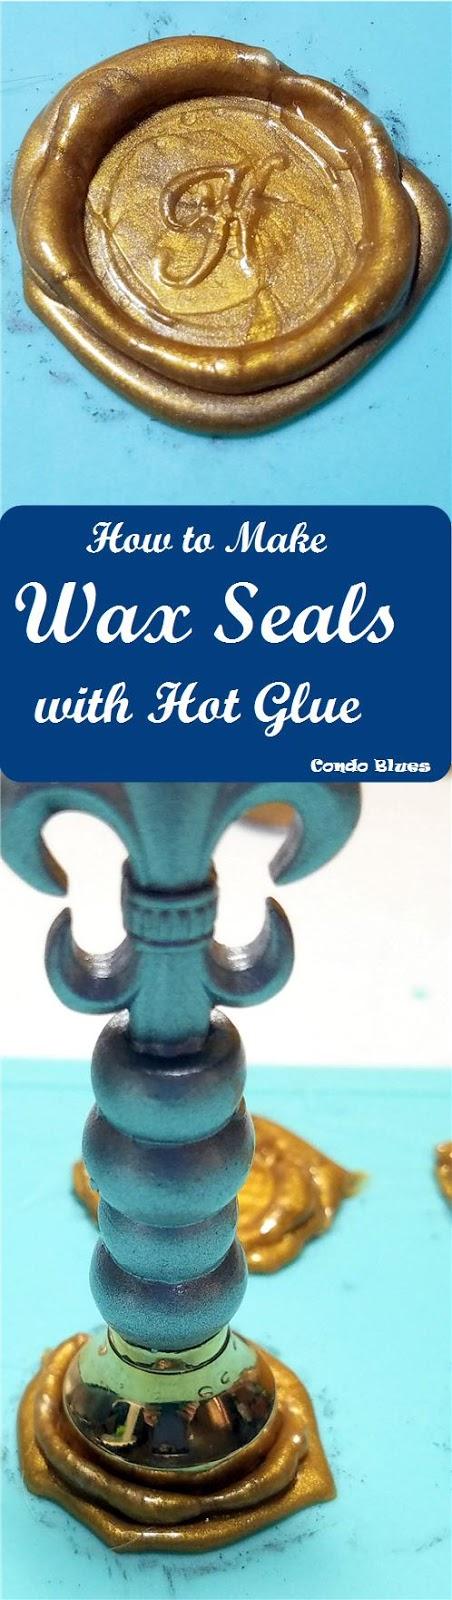 Easy DIY wax seals and hot glue gun sealing wax